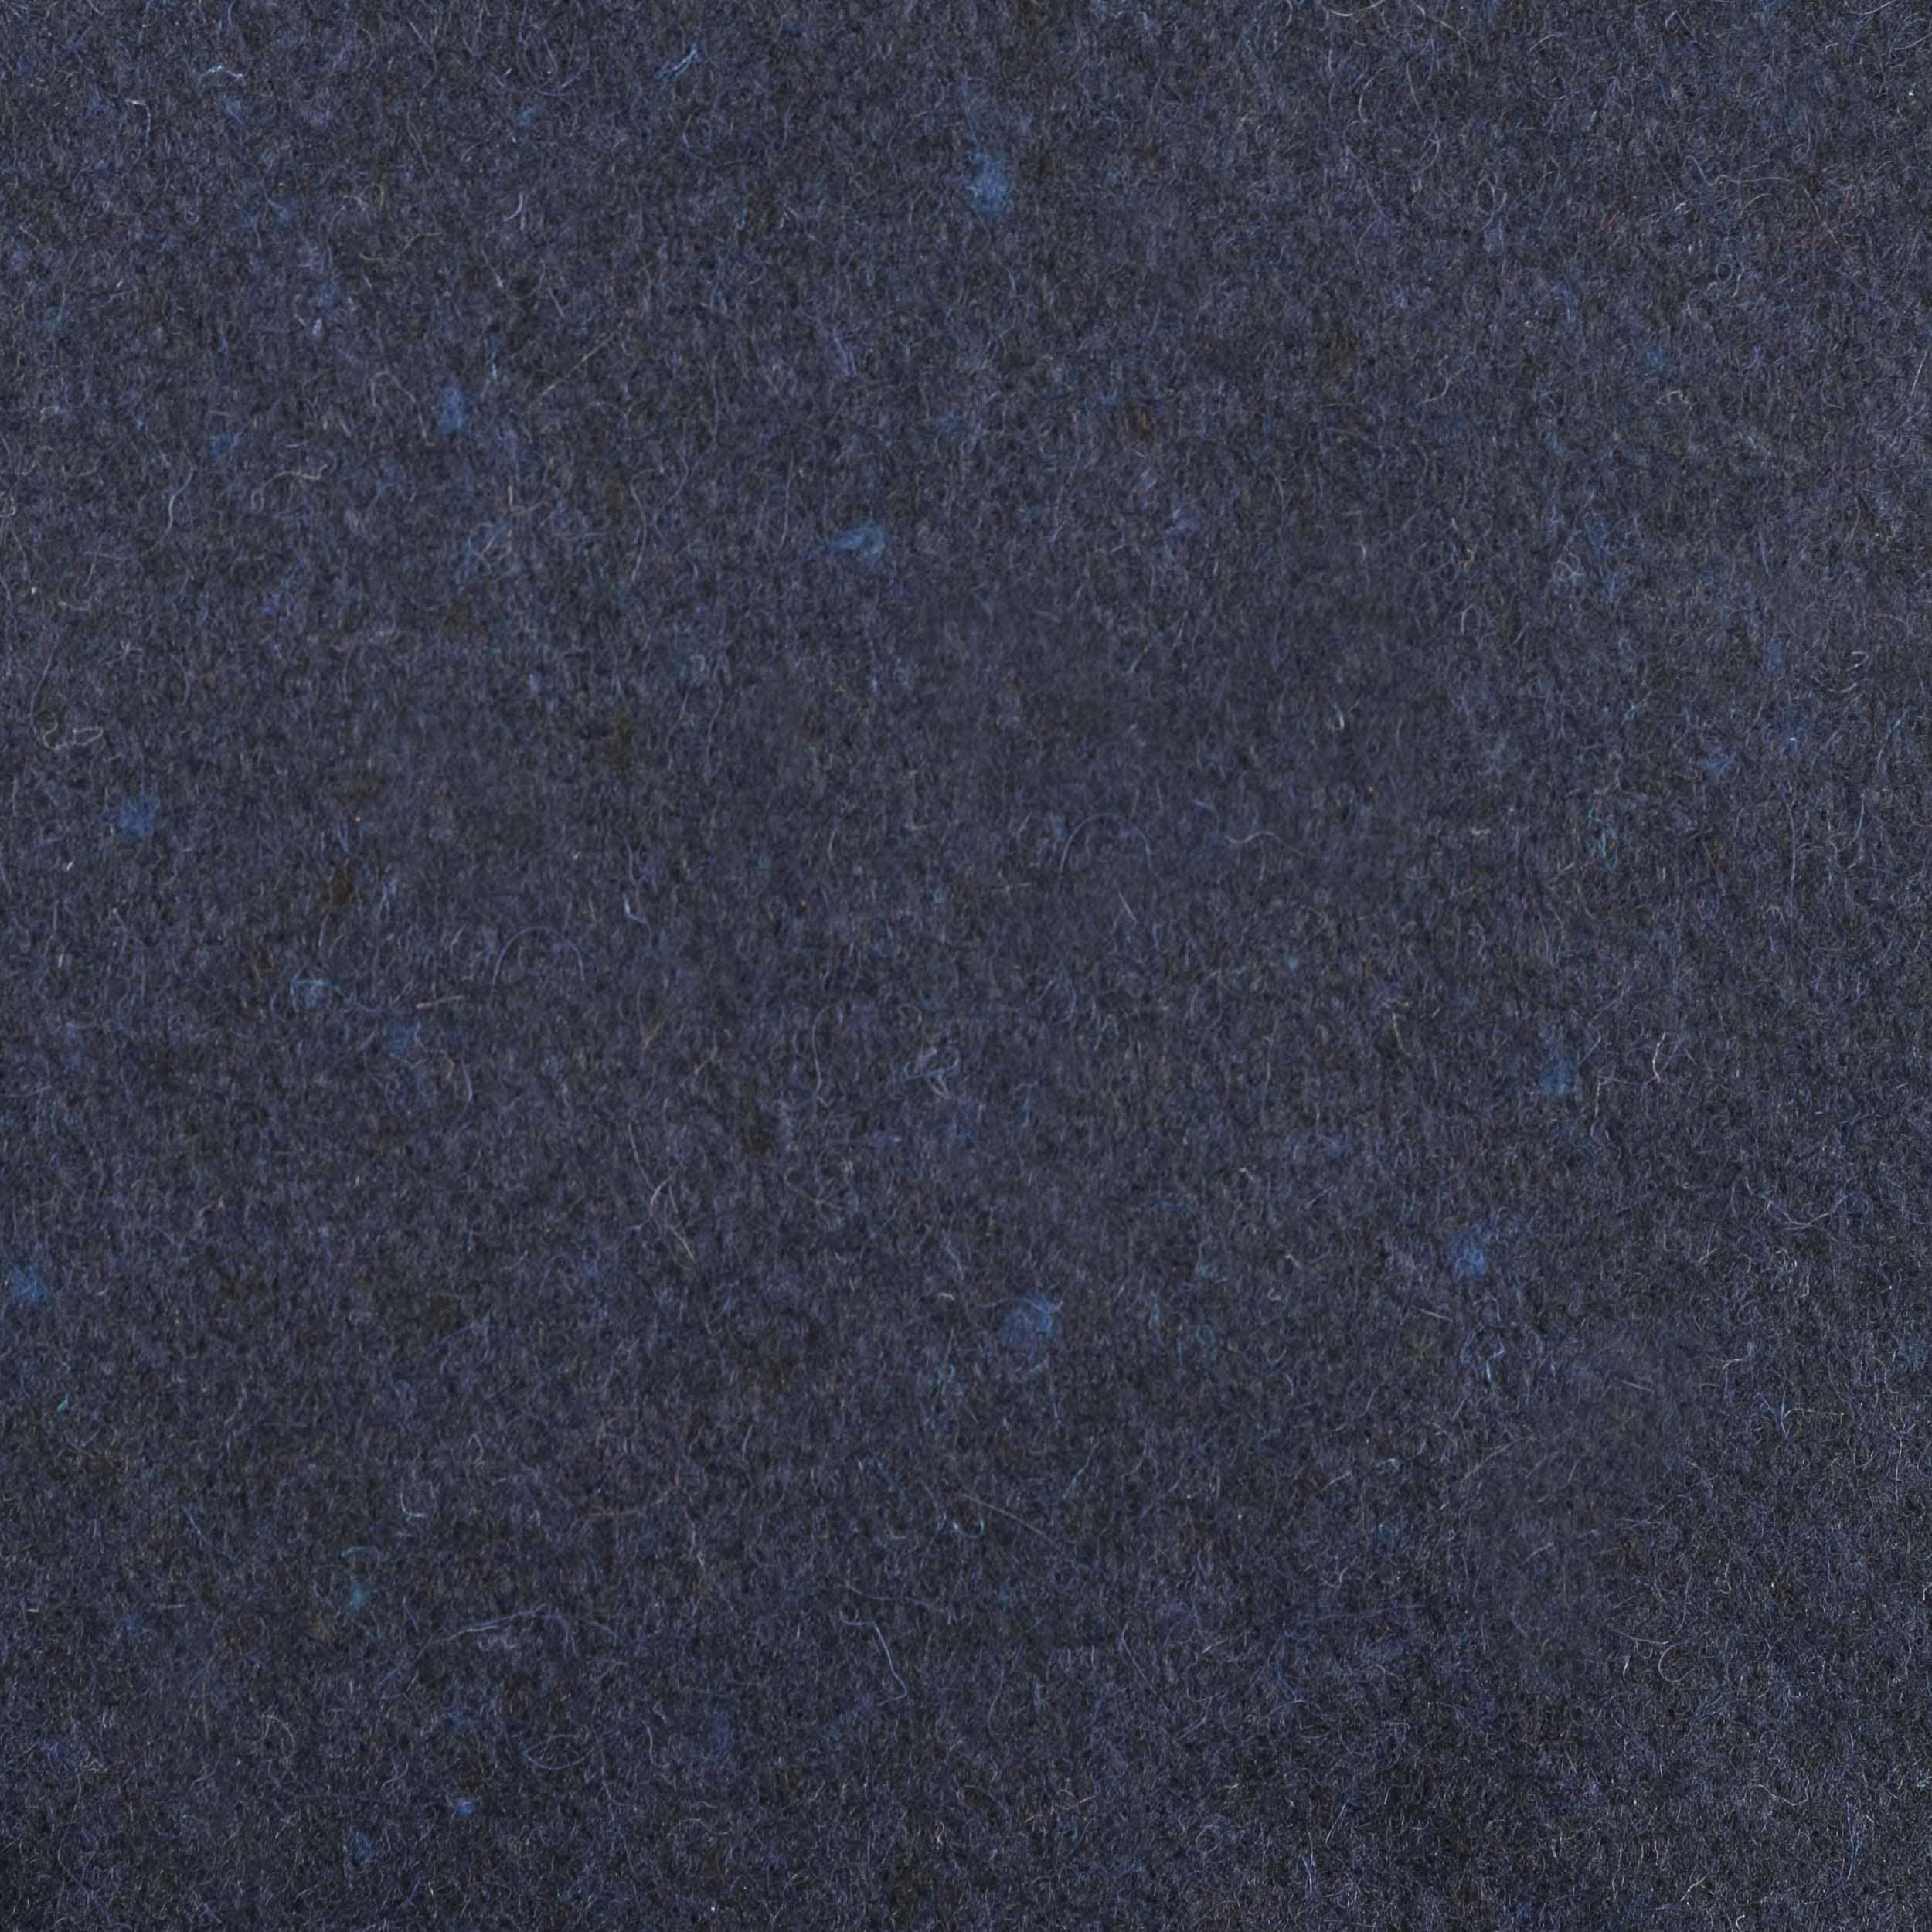 ab4c211386c ... Inglese Classic Flat Cap by Lipodo - navy 3 ...